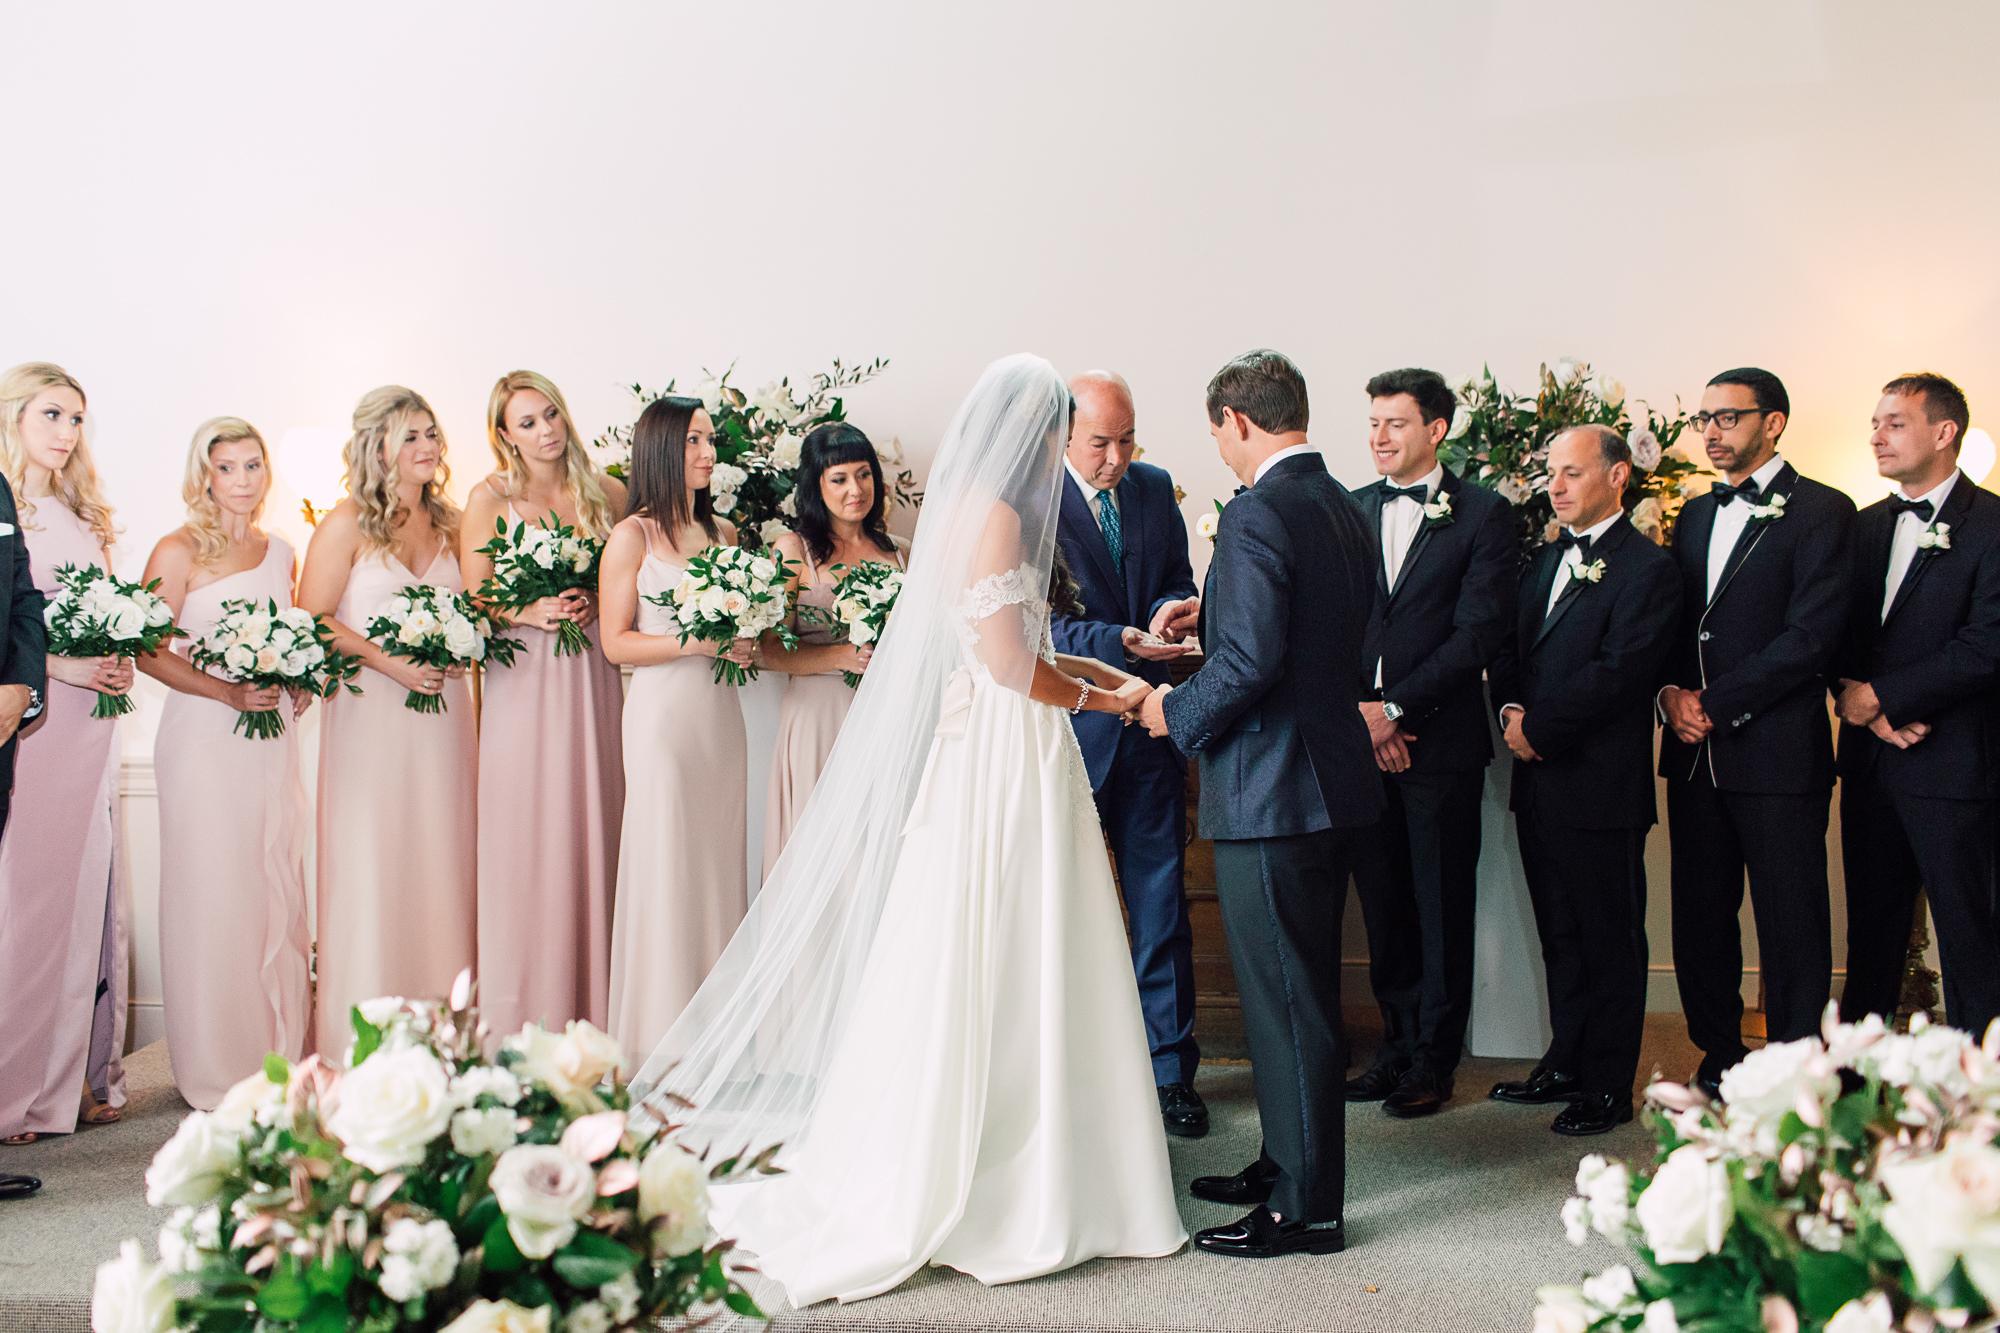 valencienne wedding dress